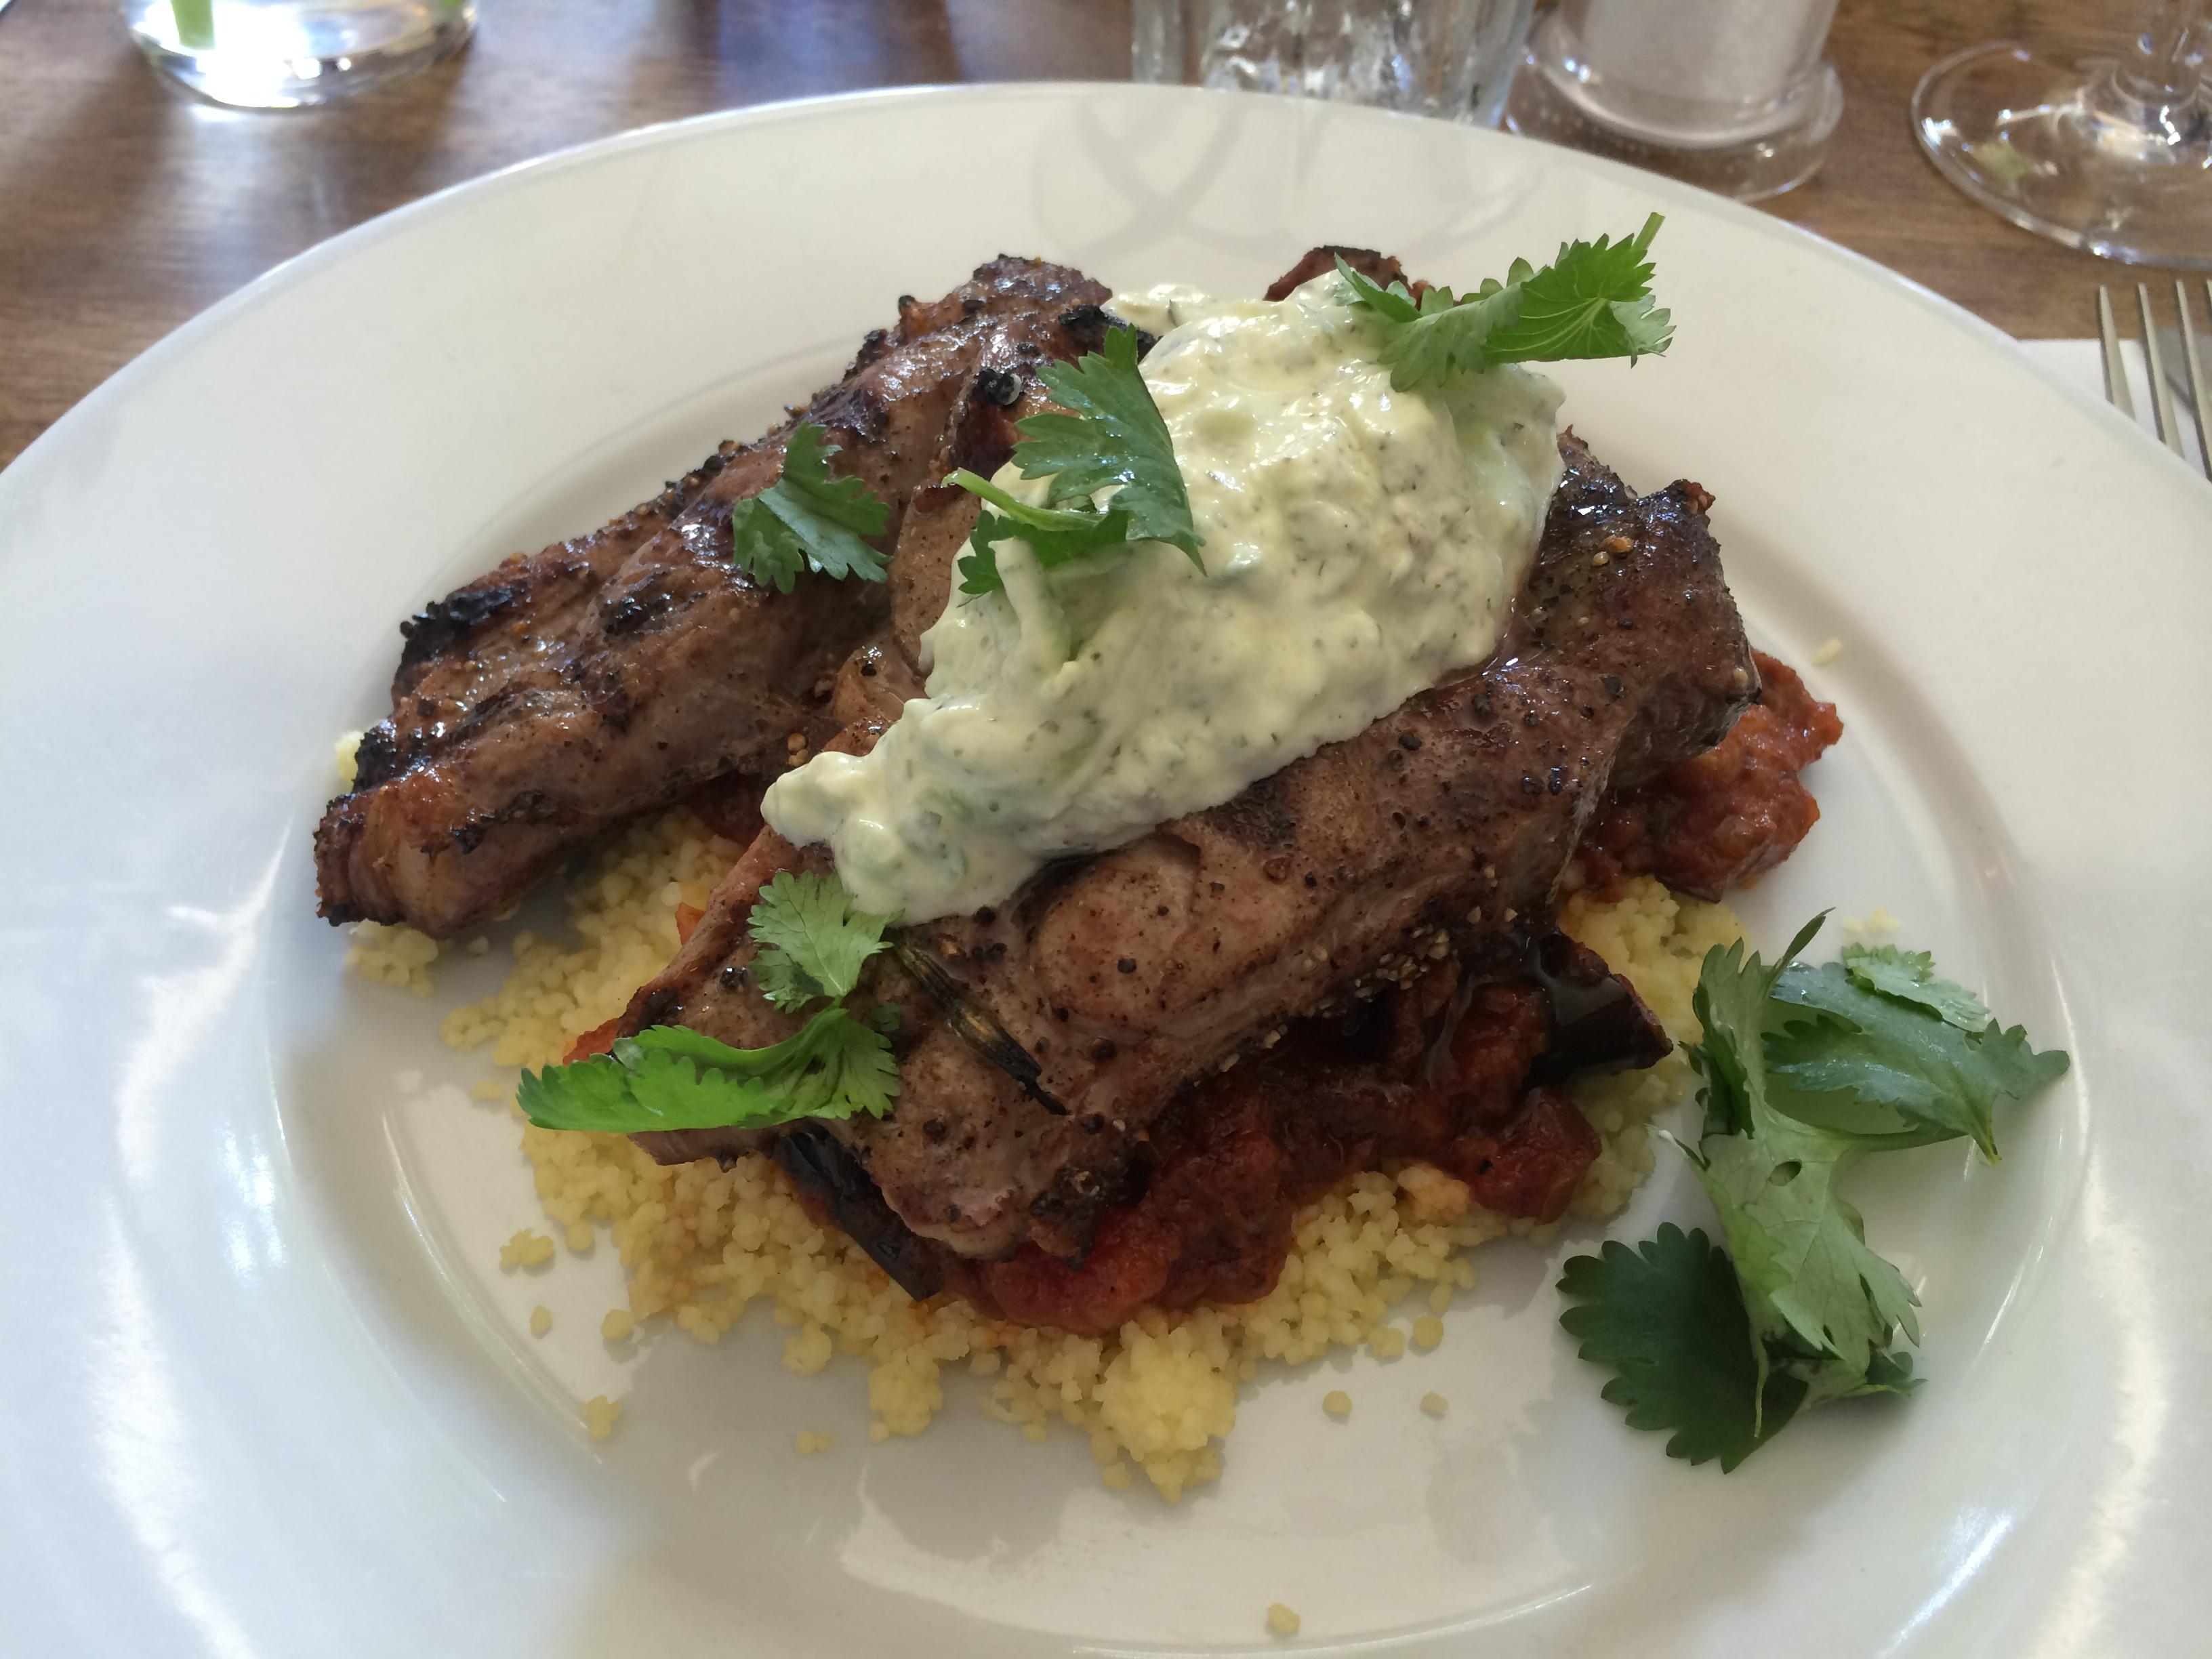 Havelock Tavern lamb steak